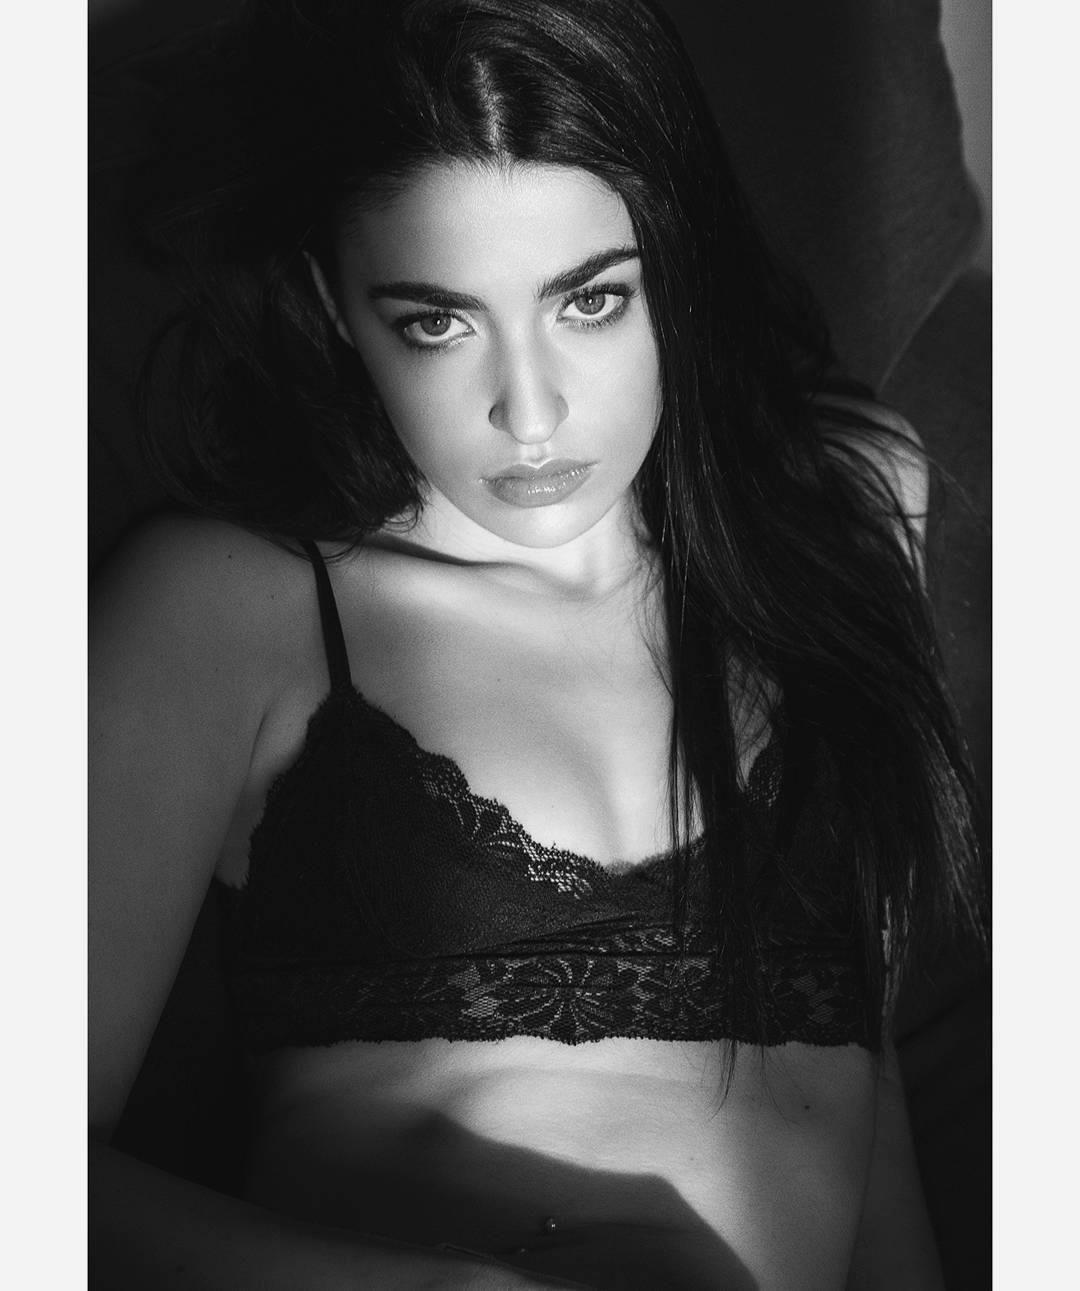 from @diego_durden | Photo by @diego_durden #model @carlotitasierra to @wantedagency #makeupartist @sanrami / #newface #test #fashionphotographer #portrait #instafashion #beautiful #modelo #mood #attitude #photographer #blackandwhite #blogger #bnw #makeup #mua #monochrome #cute #fashion #instagram #beauty #gorgeous #testmodel #boudoir #fashionphotography | November 24 2016 {from |via }Insta